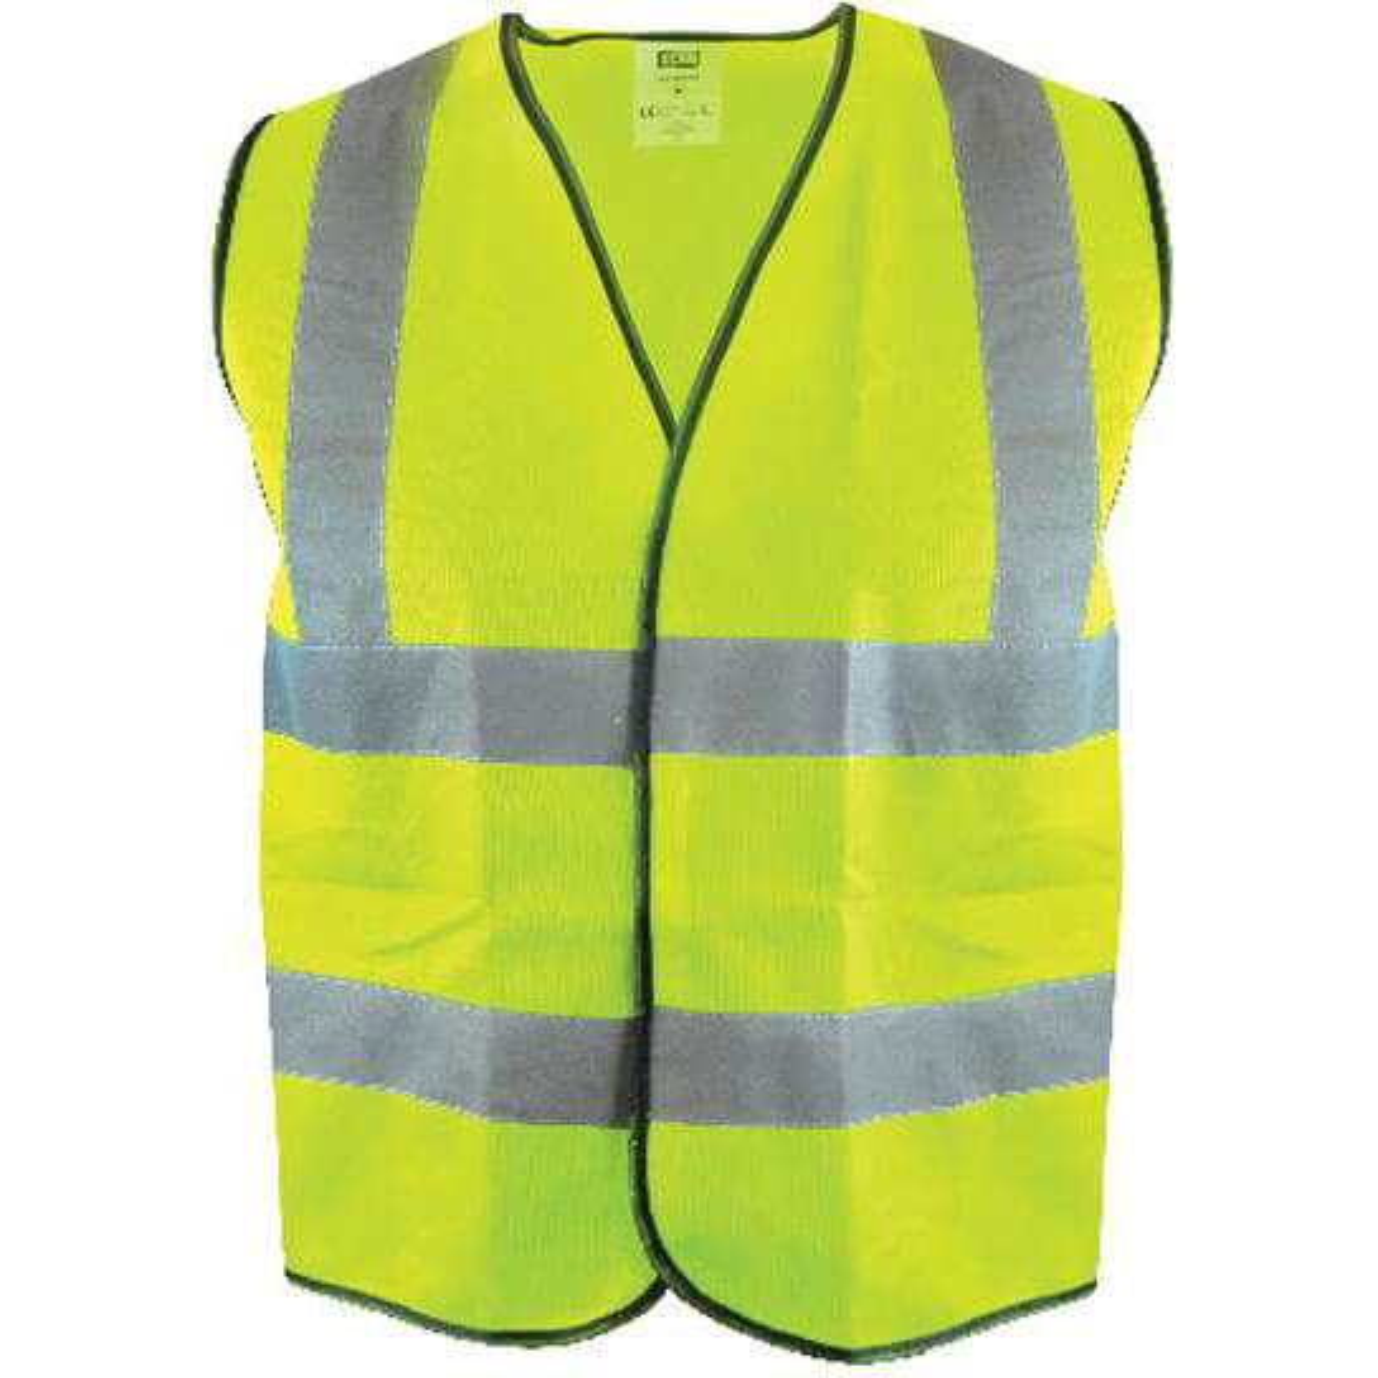 Image of Scan Hi Vis Waistcoat Yellow 2XL